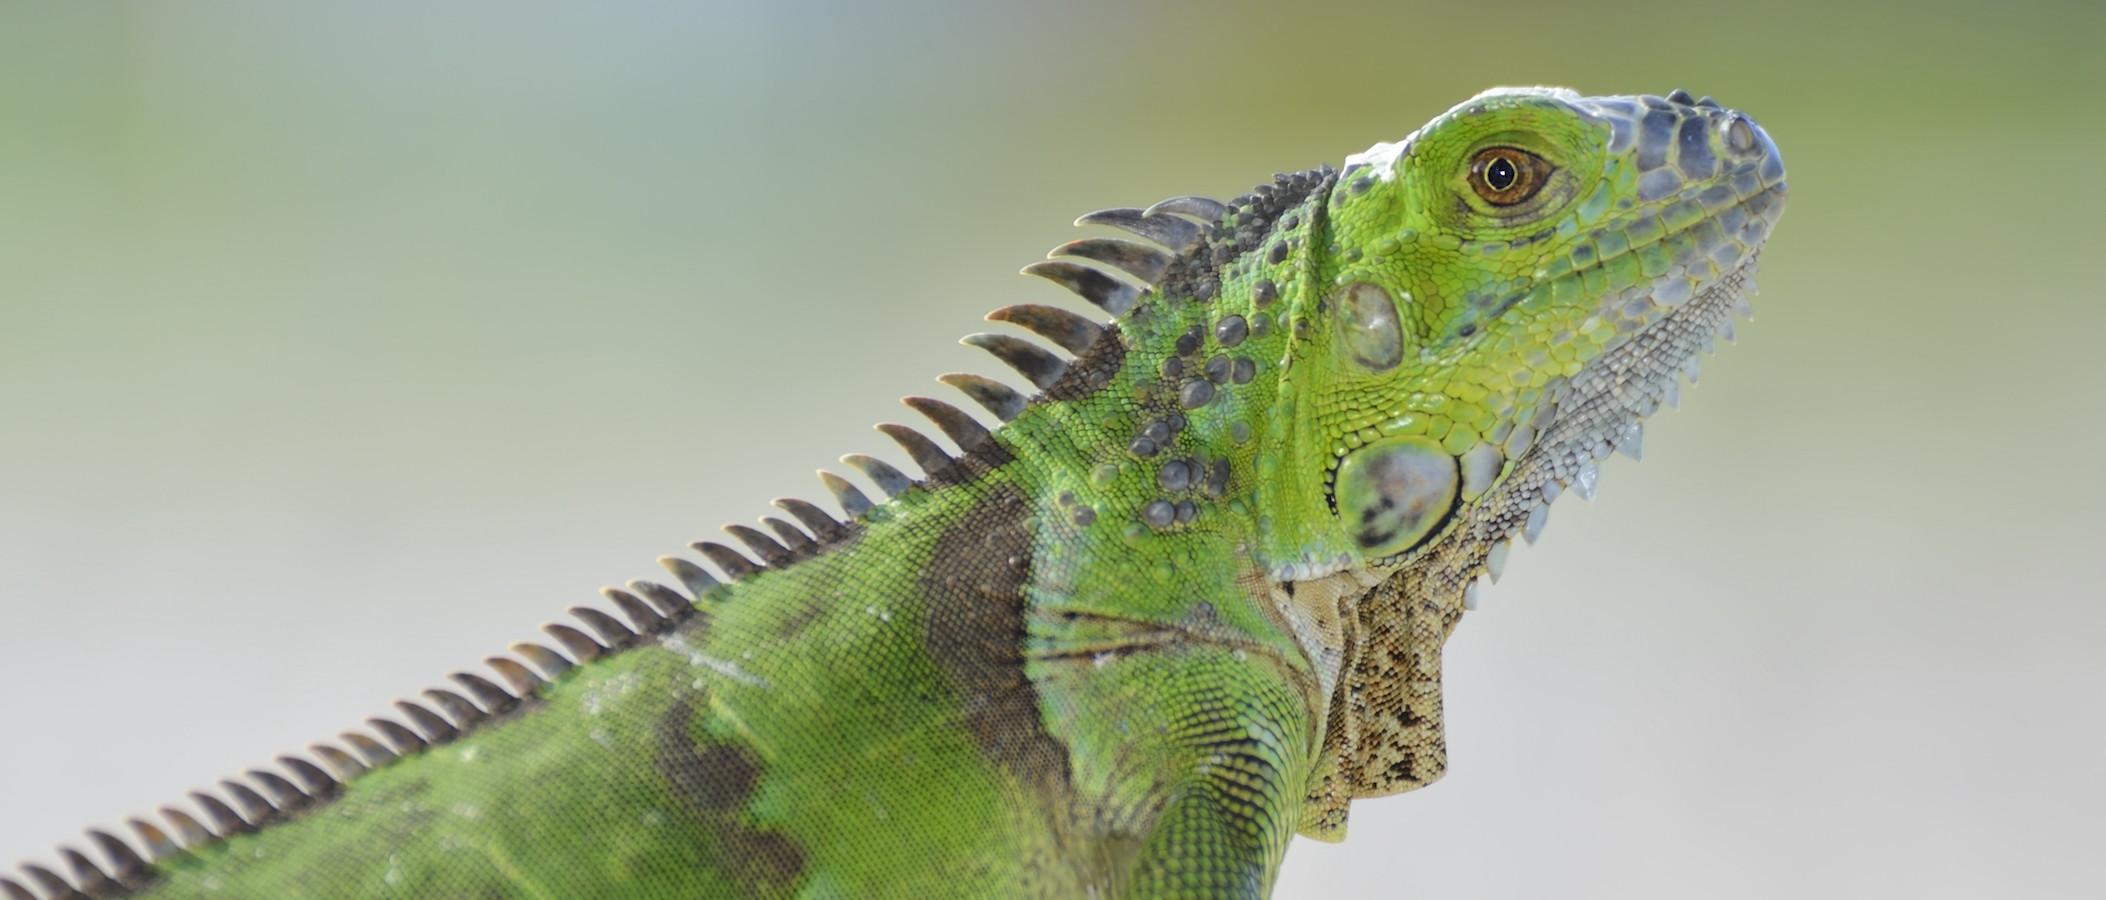 Green Iguana Basking On The Stone Wall